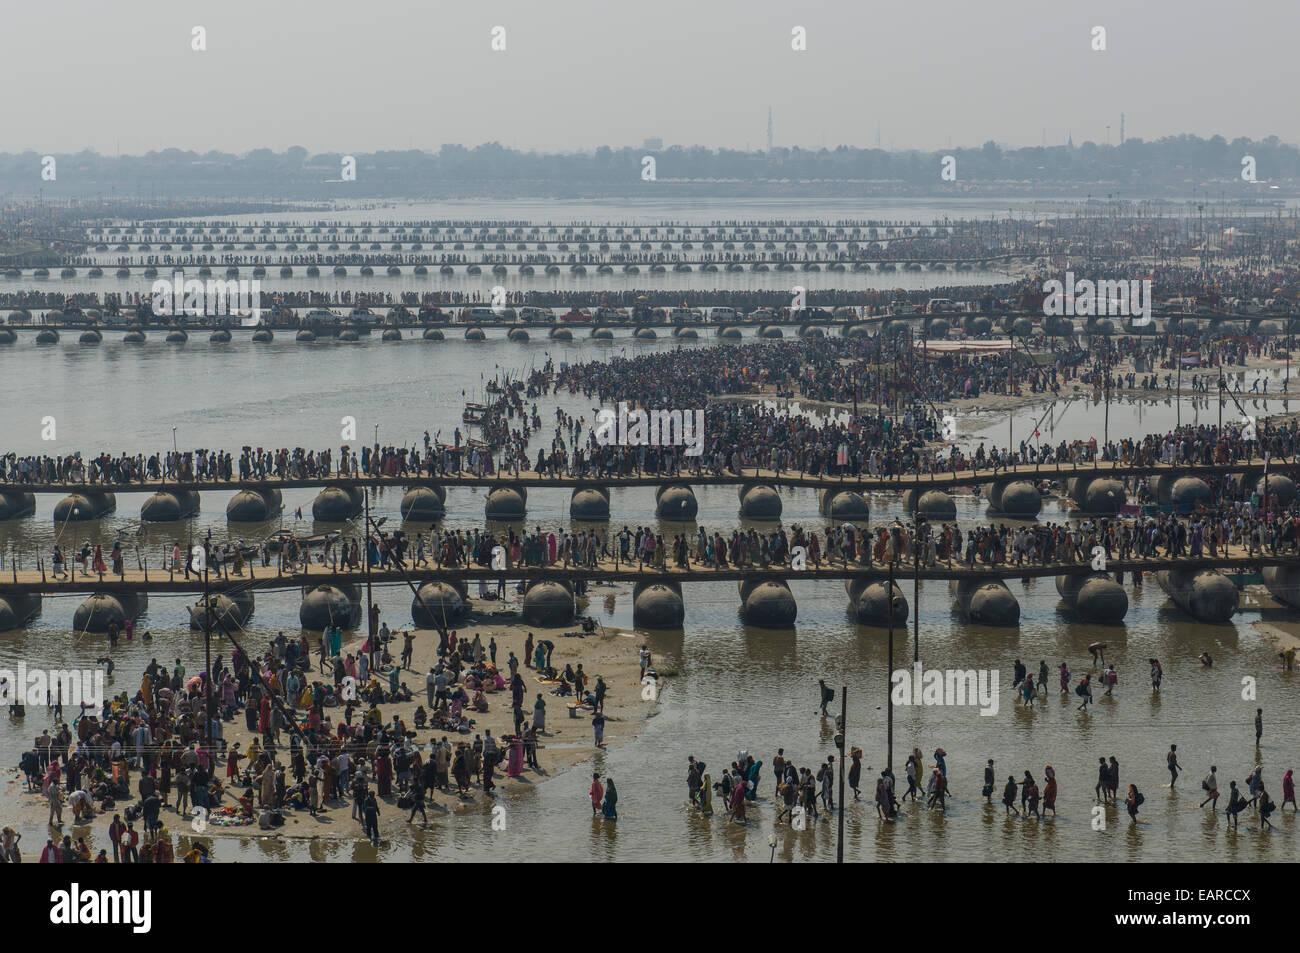 De nombreux ponts ponton traversant le Gange à la Kumbha Mela, Allahabad, Uttar Pradesh, Inde Photo Stock